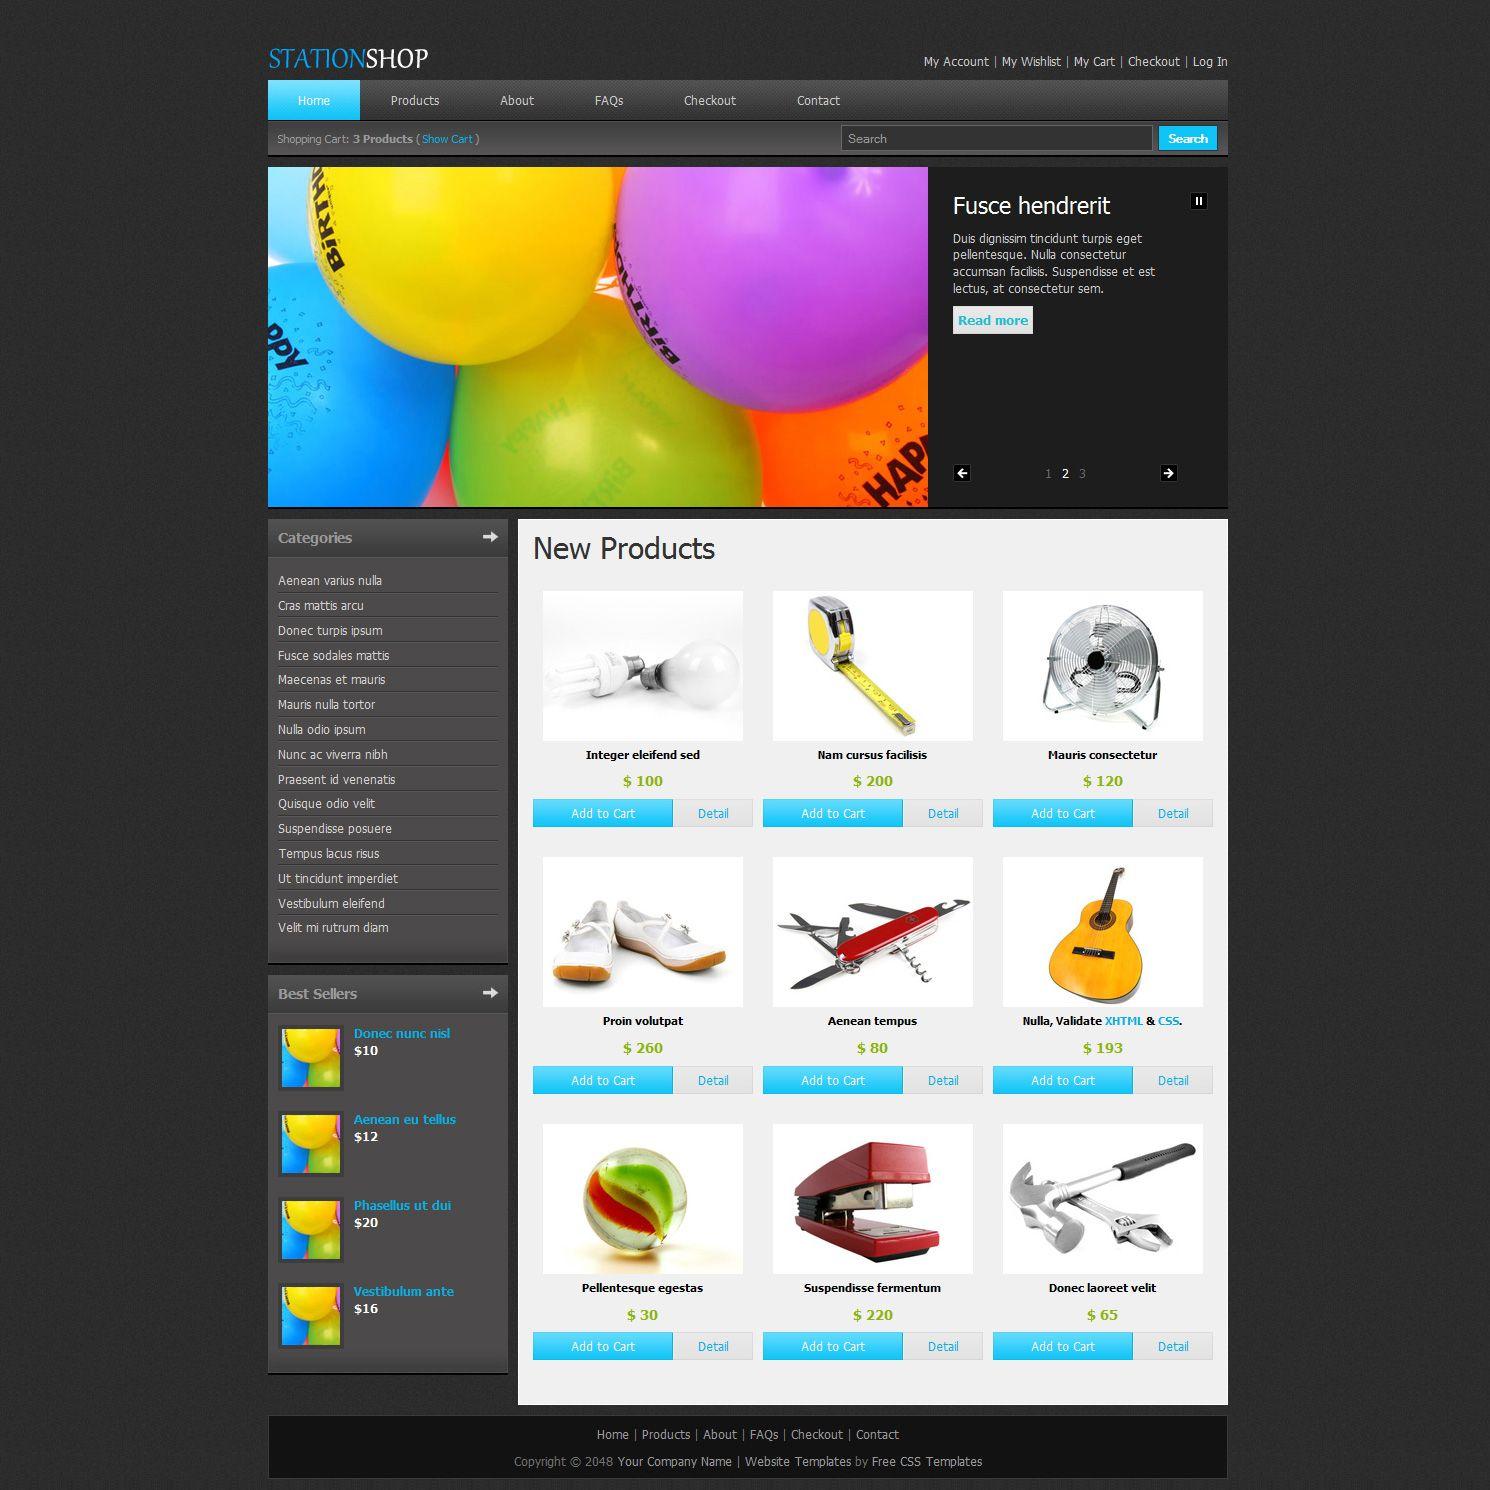 352 Station Shop Template Dreamweaver Template Free Dreamweaver Templates Templates Free Download